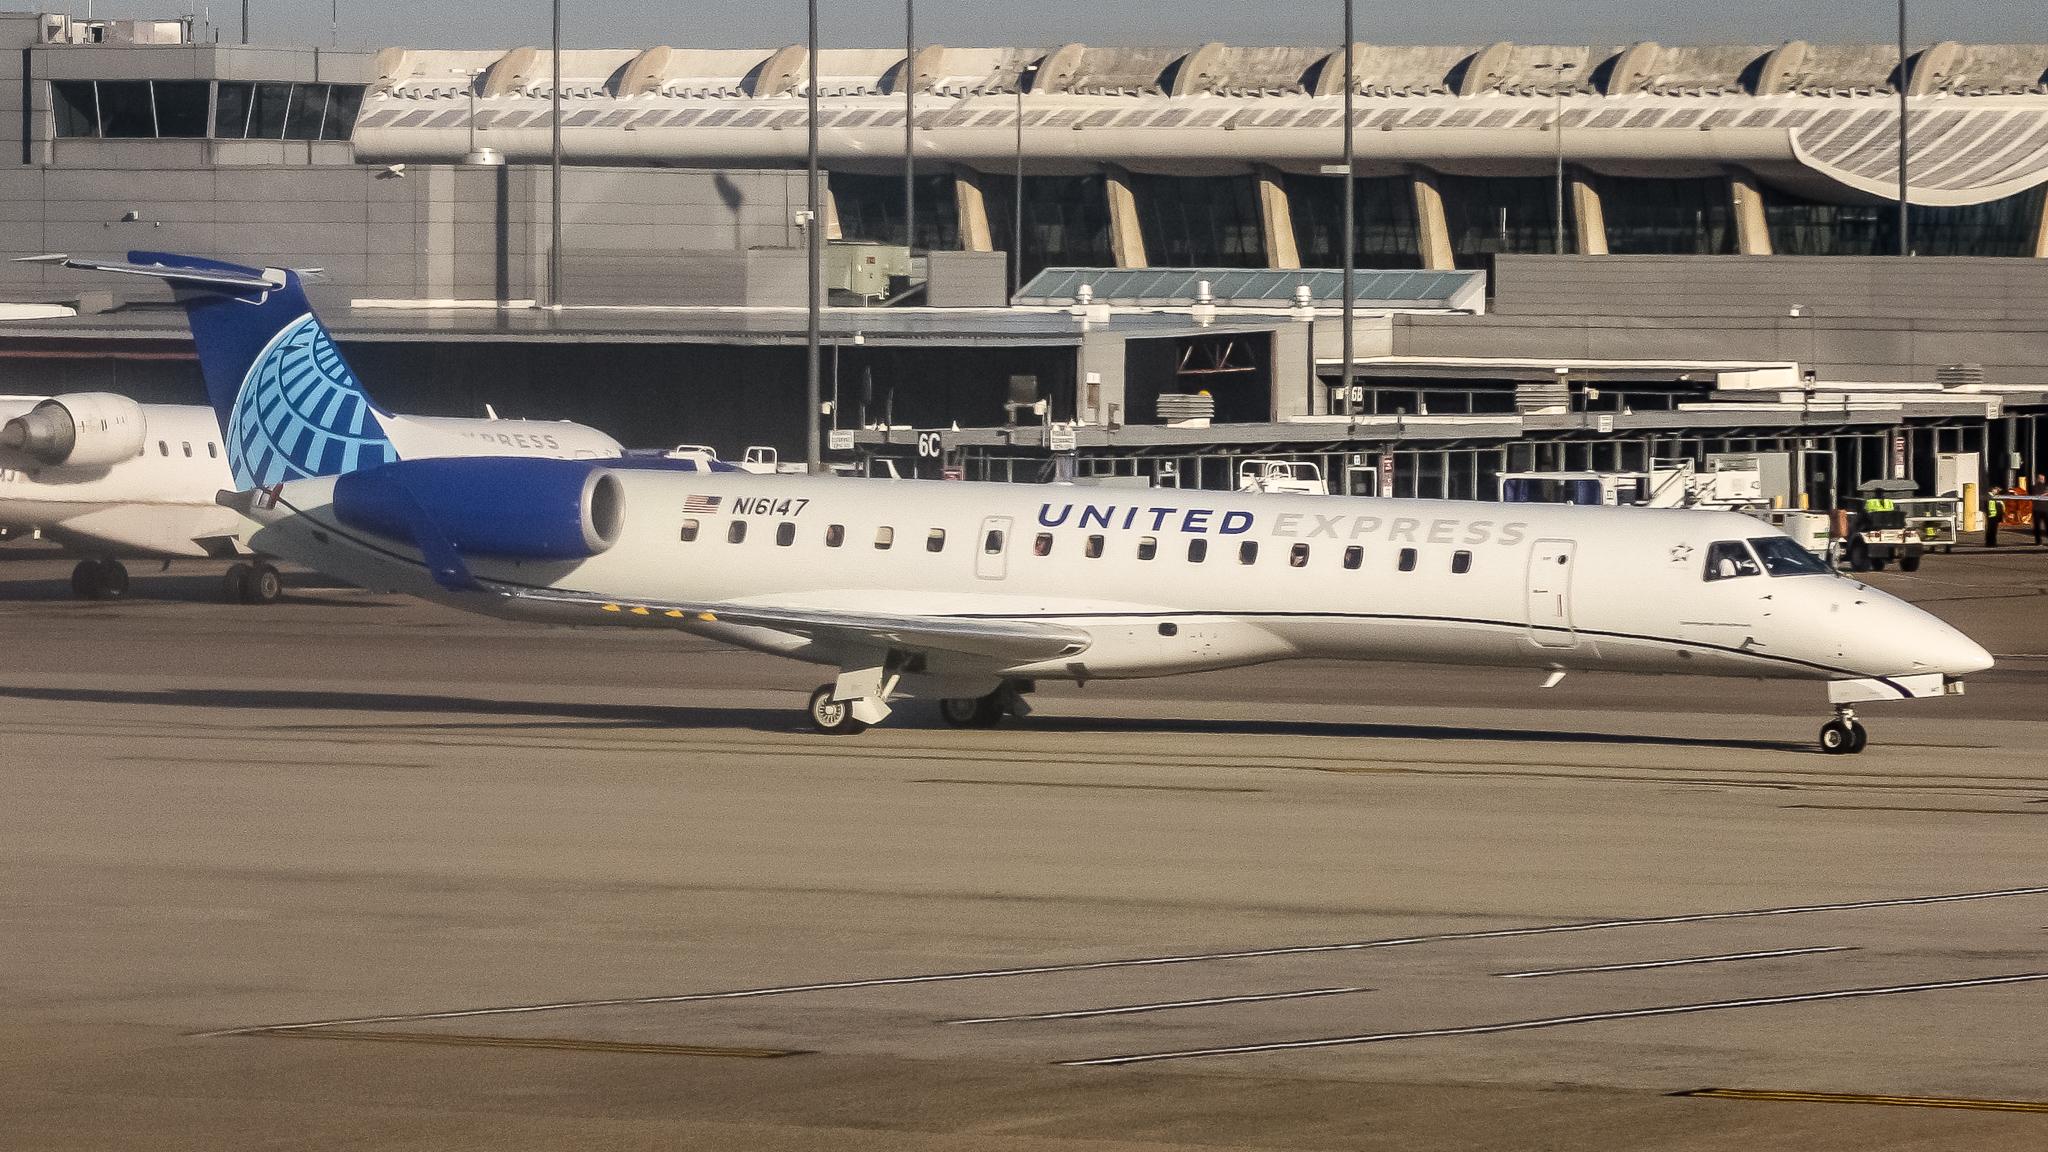 Photo of N16147 - United Express Embraer E145 at IAD